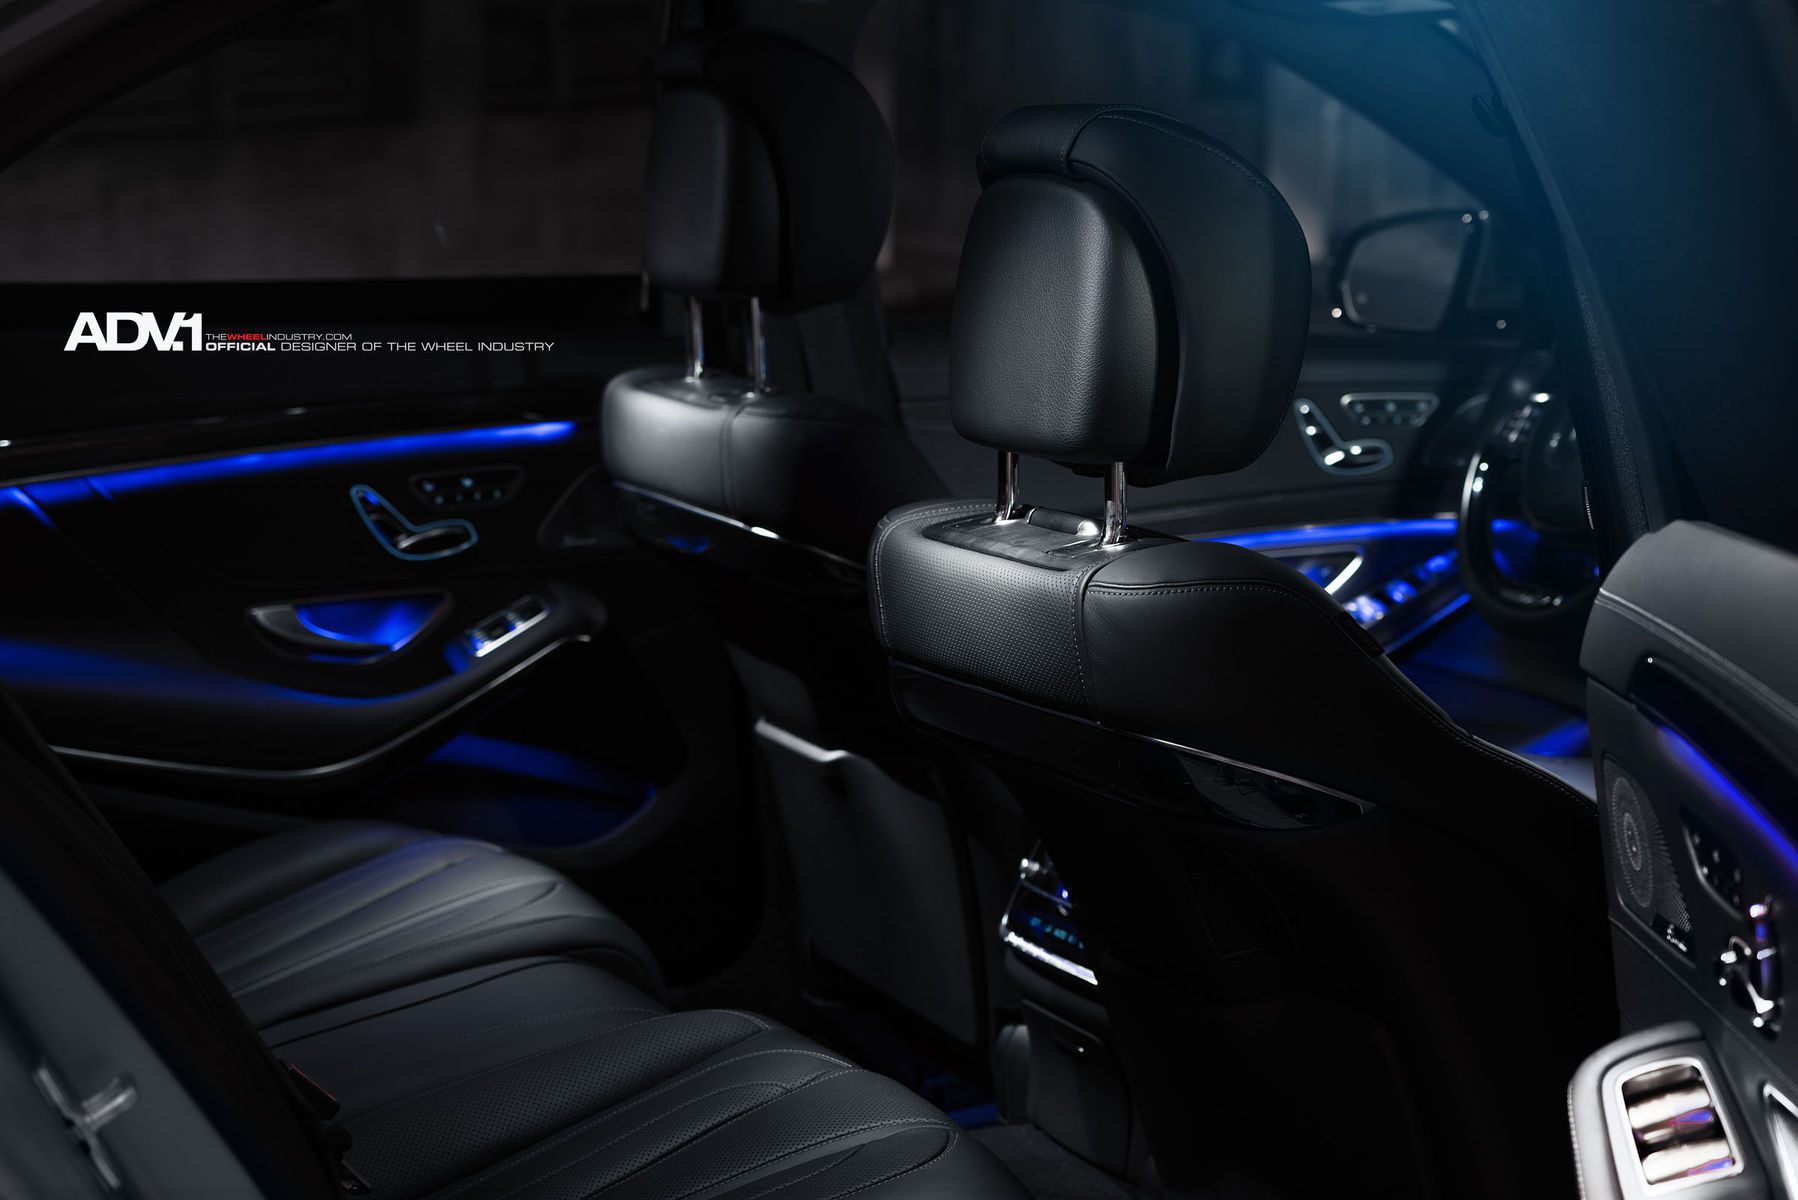 2015 Mercedes-Benz S-Class | Mercedes Benz S63 AMG Sedan